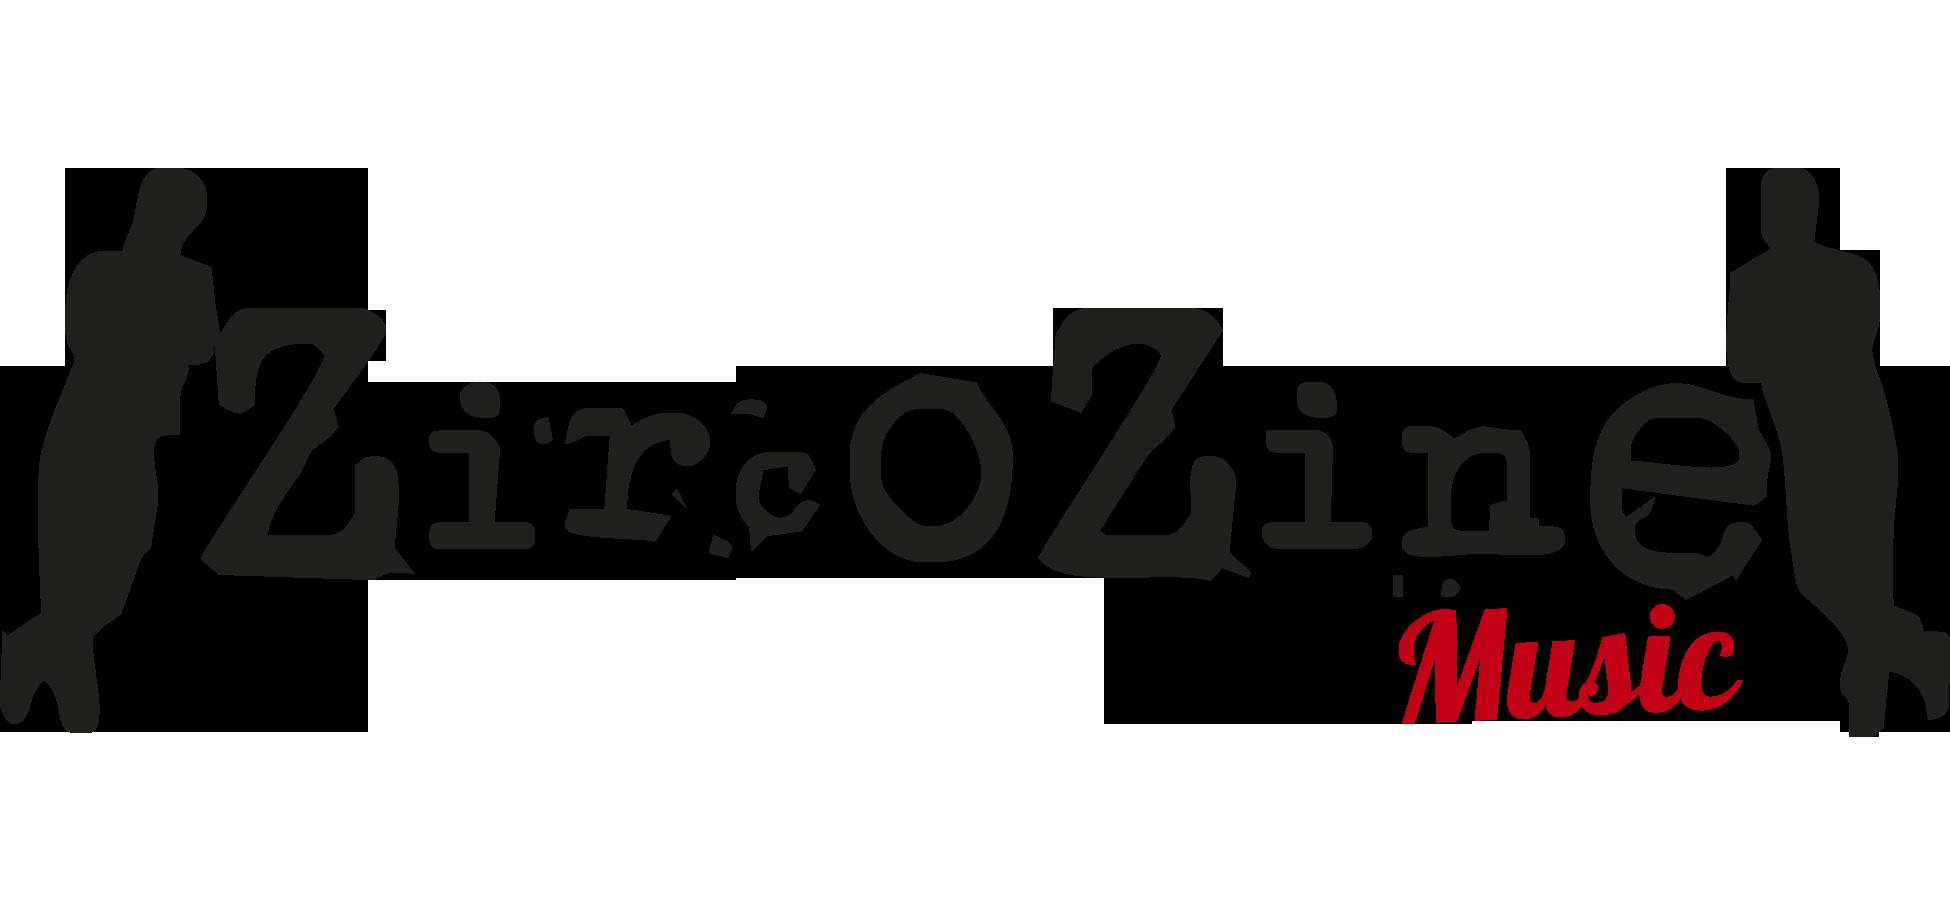 Zircozine S.L.